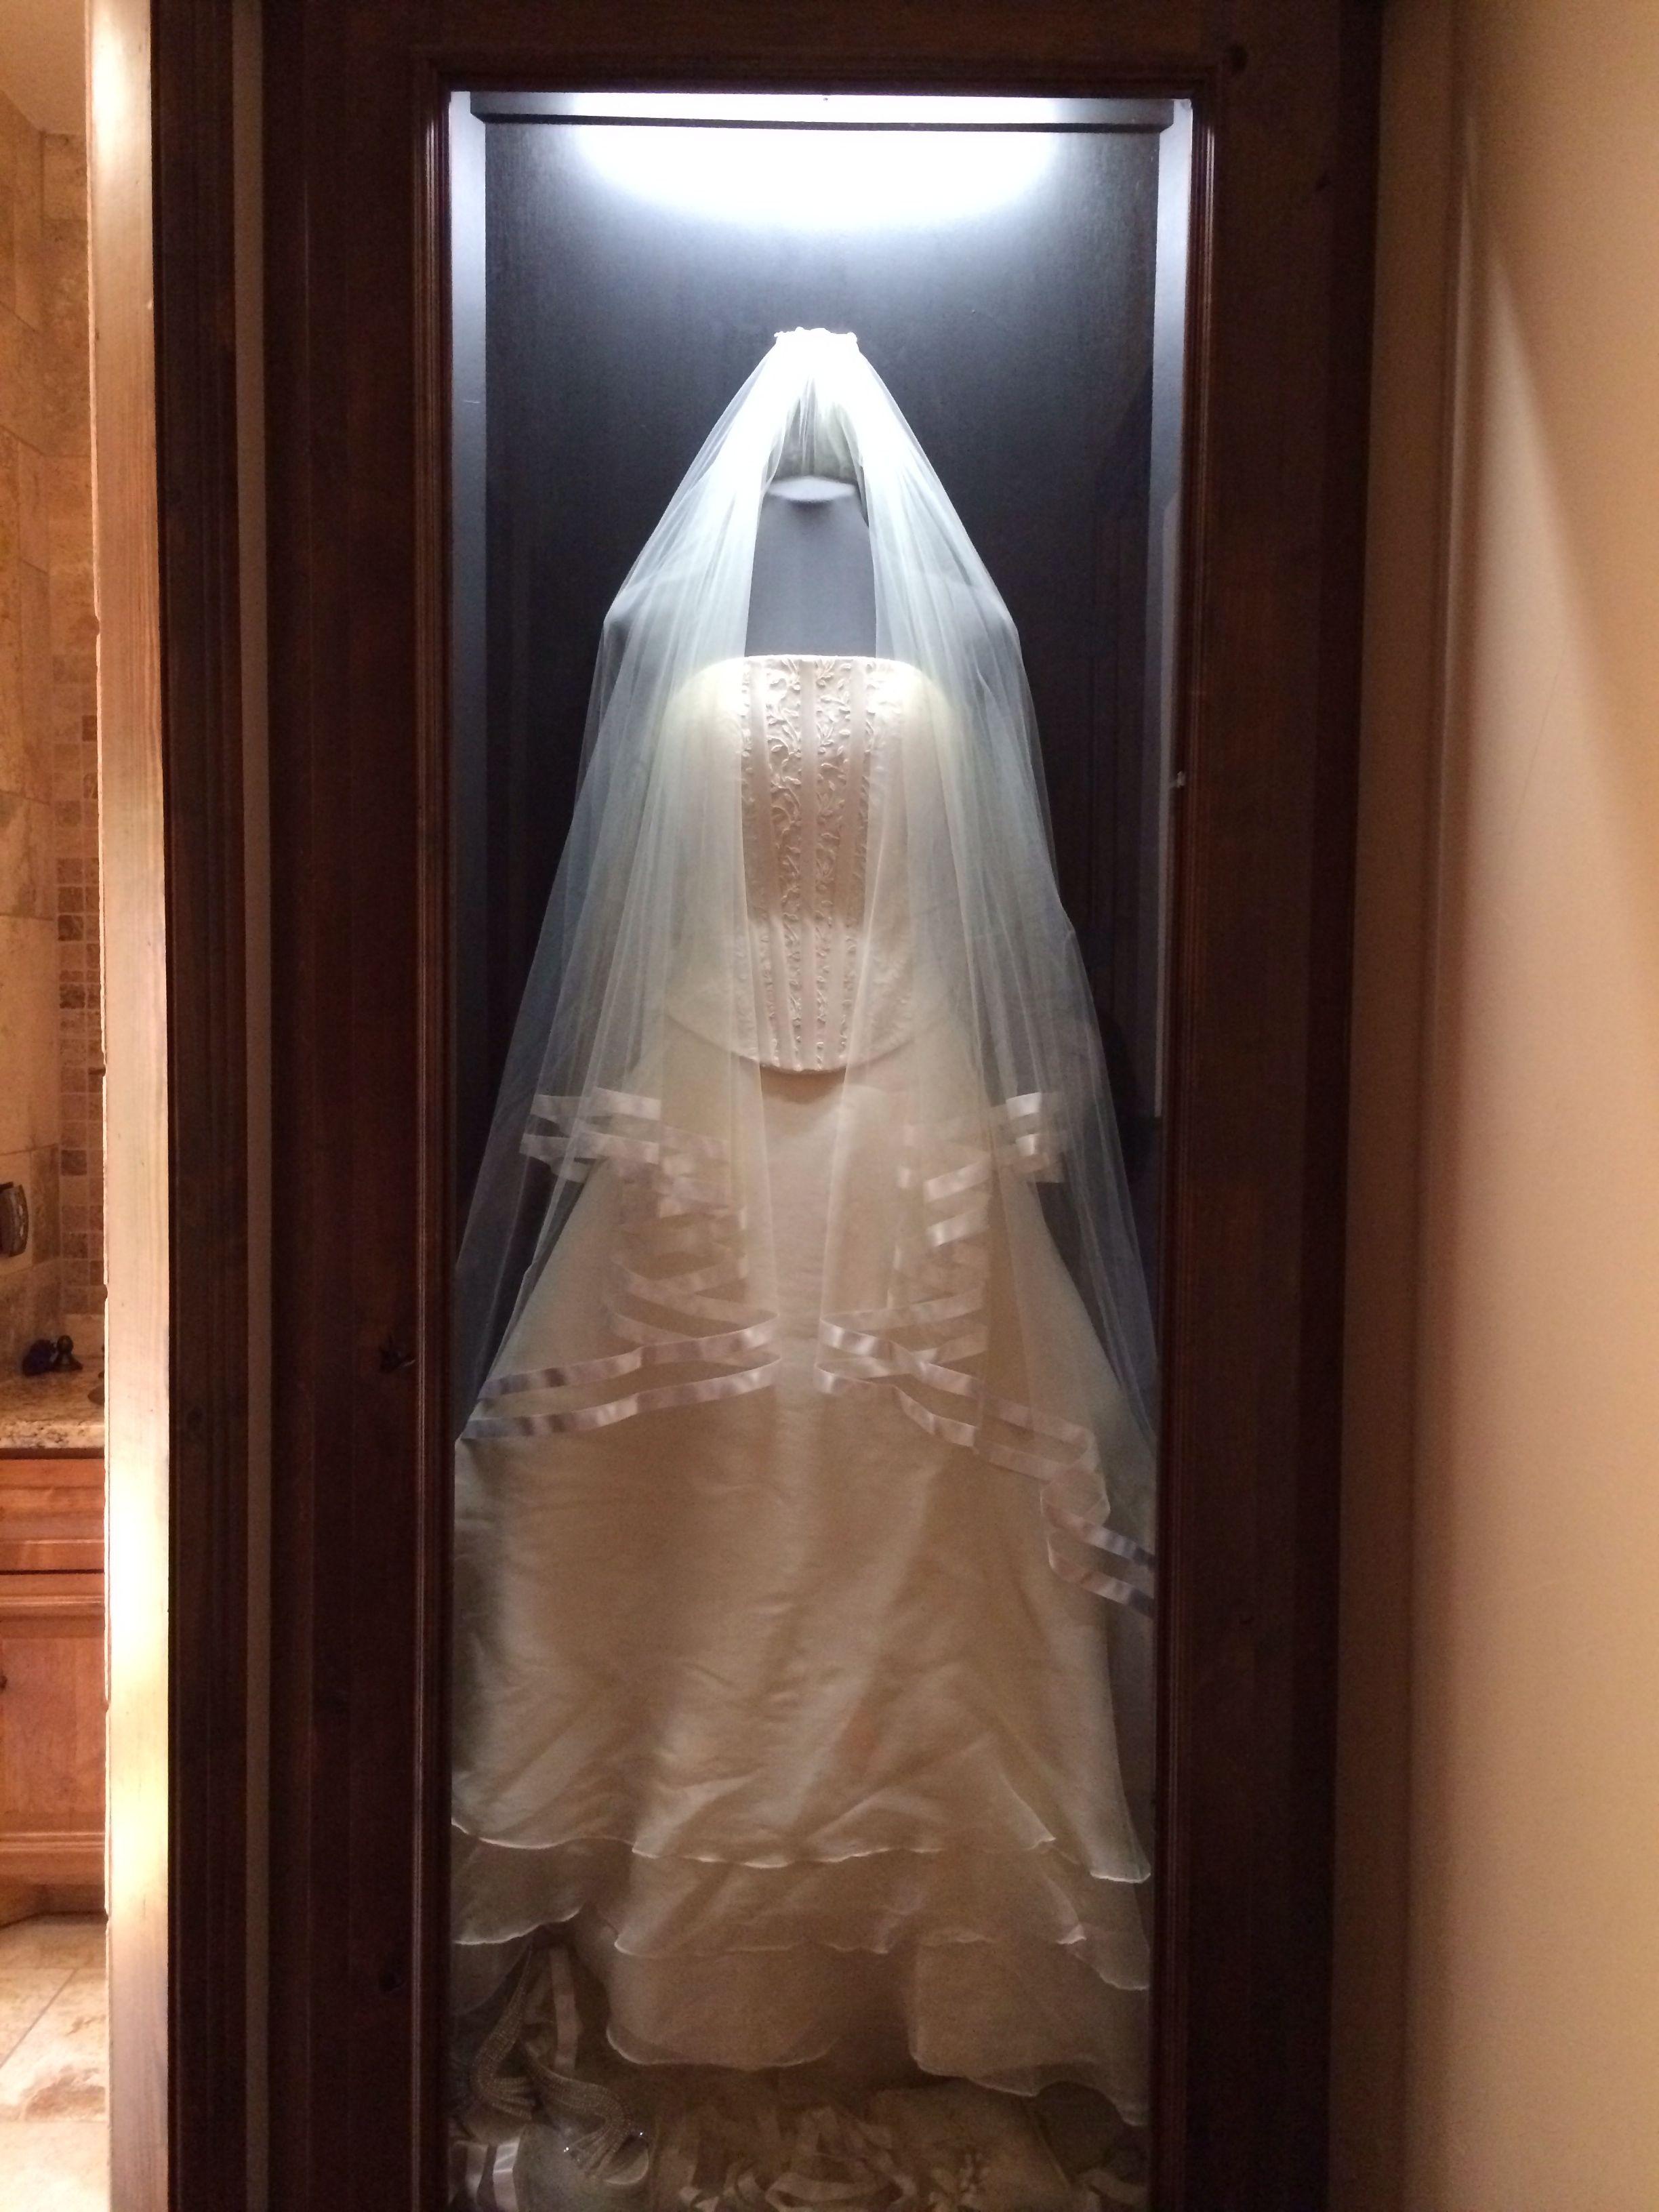 Pin By Cris Sanchez On Dream Wedding Wedding Dress Shadow Box Wedding Dress Display Wedding Shadow Box